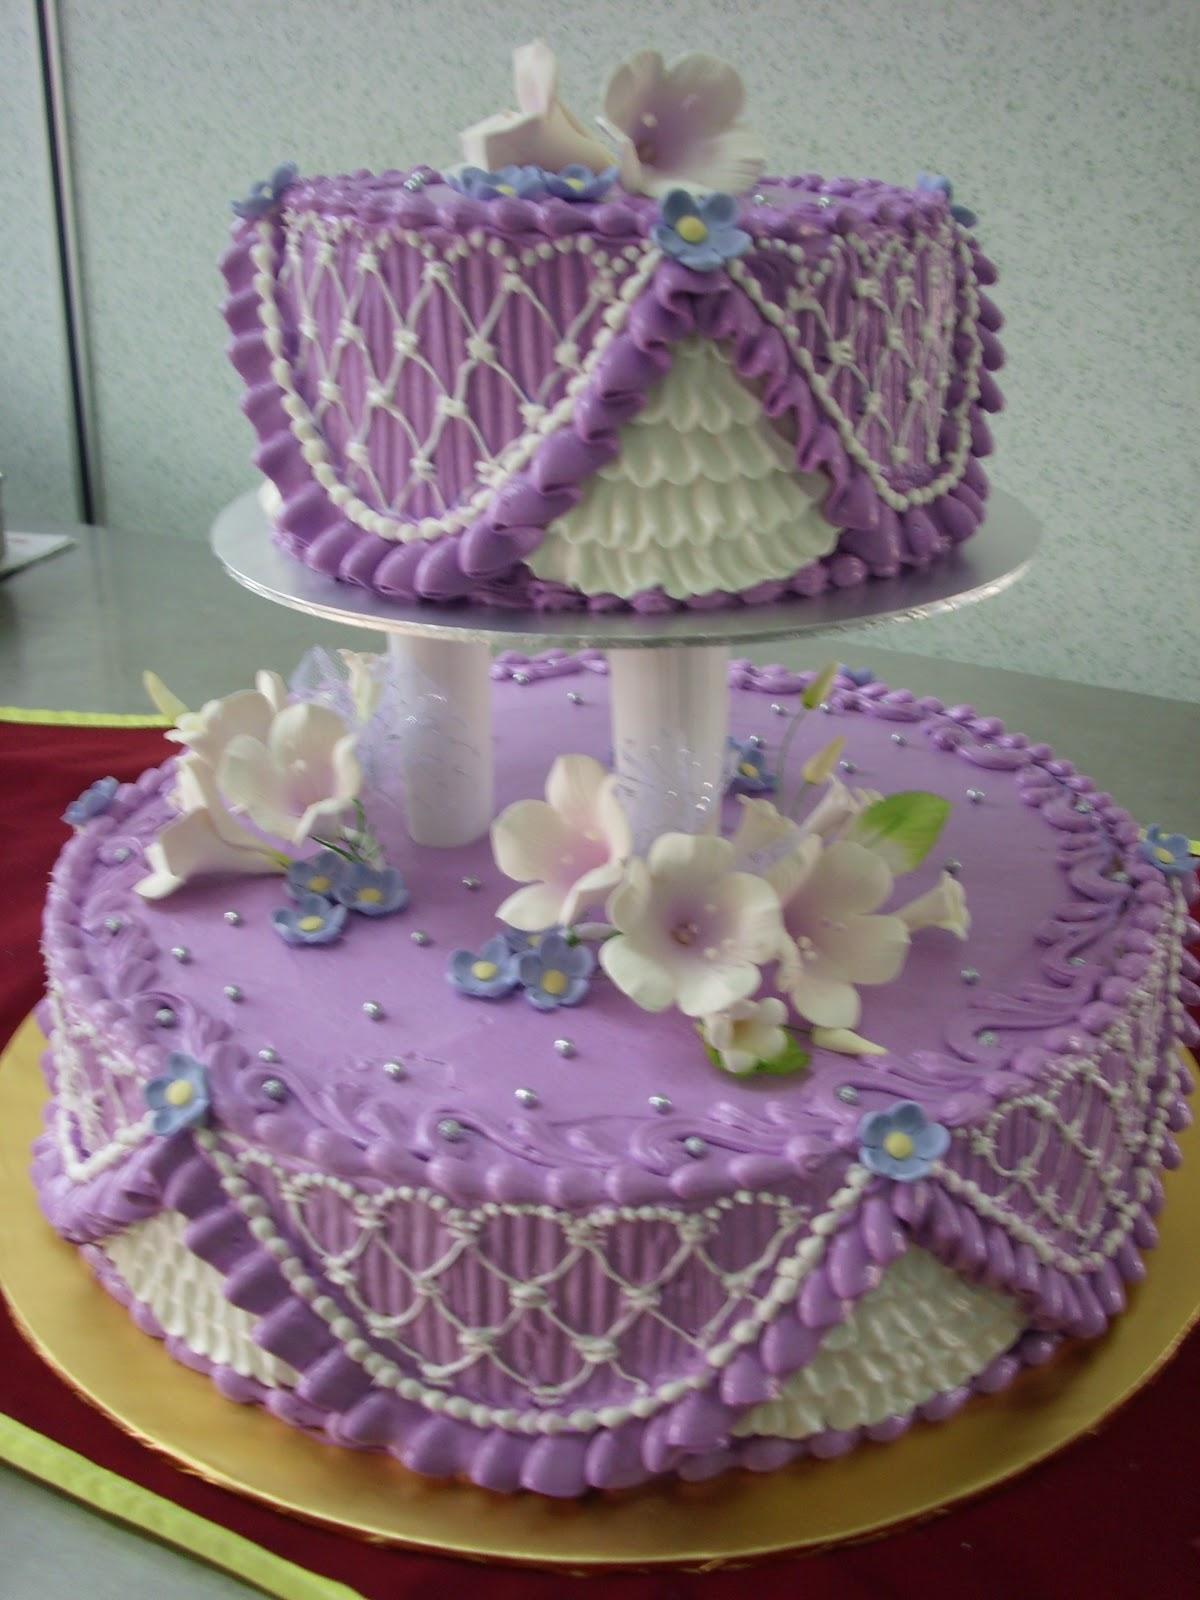 ESCUELA de Creatividades Latinas: ADVANCED CAKE DECORATING